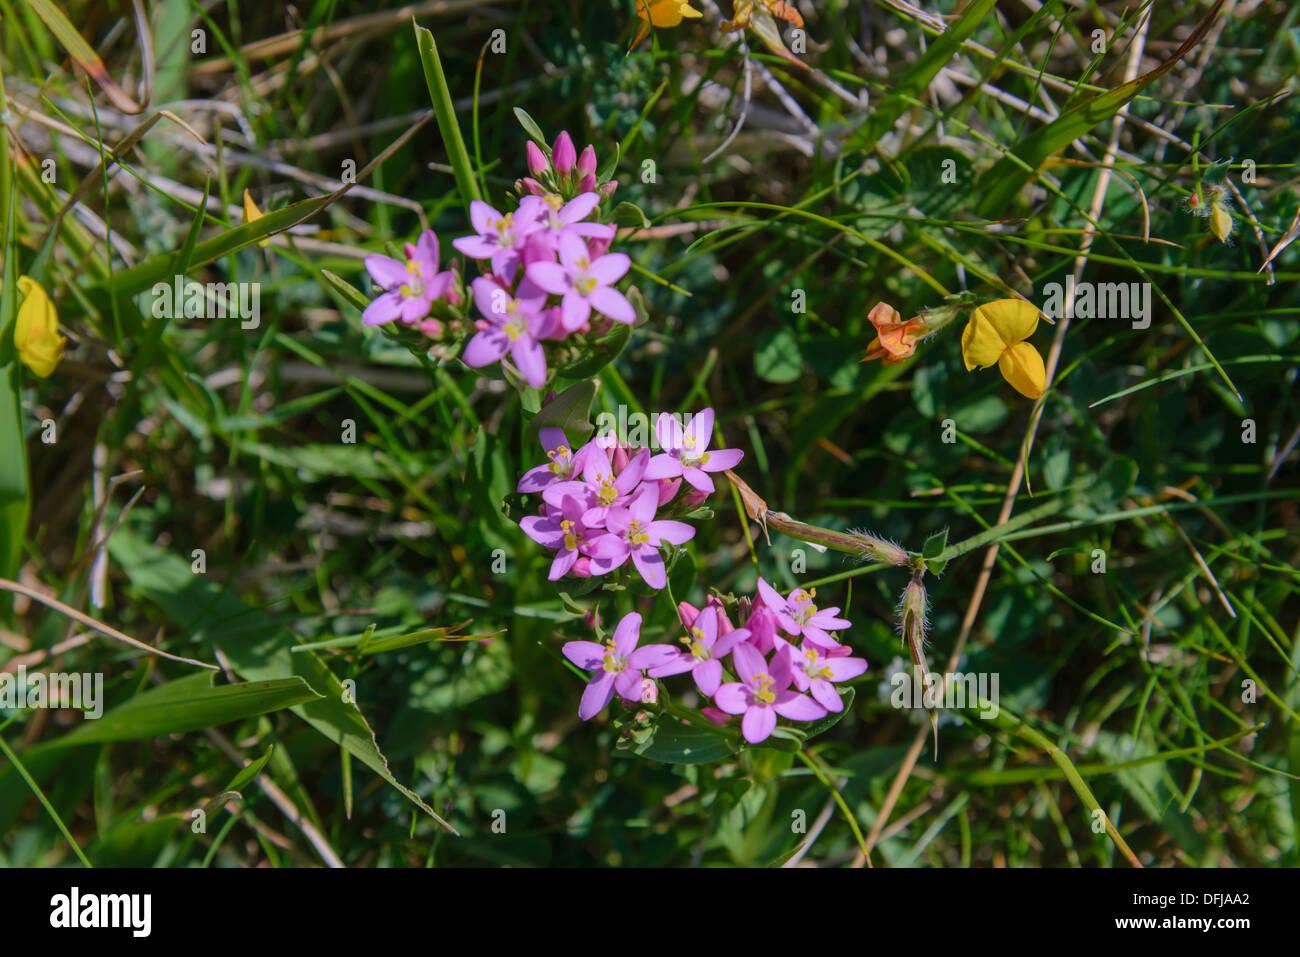 Common Centaury, Centaurium erythraea, Wildflowers, Dorset, England - Stock Image